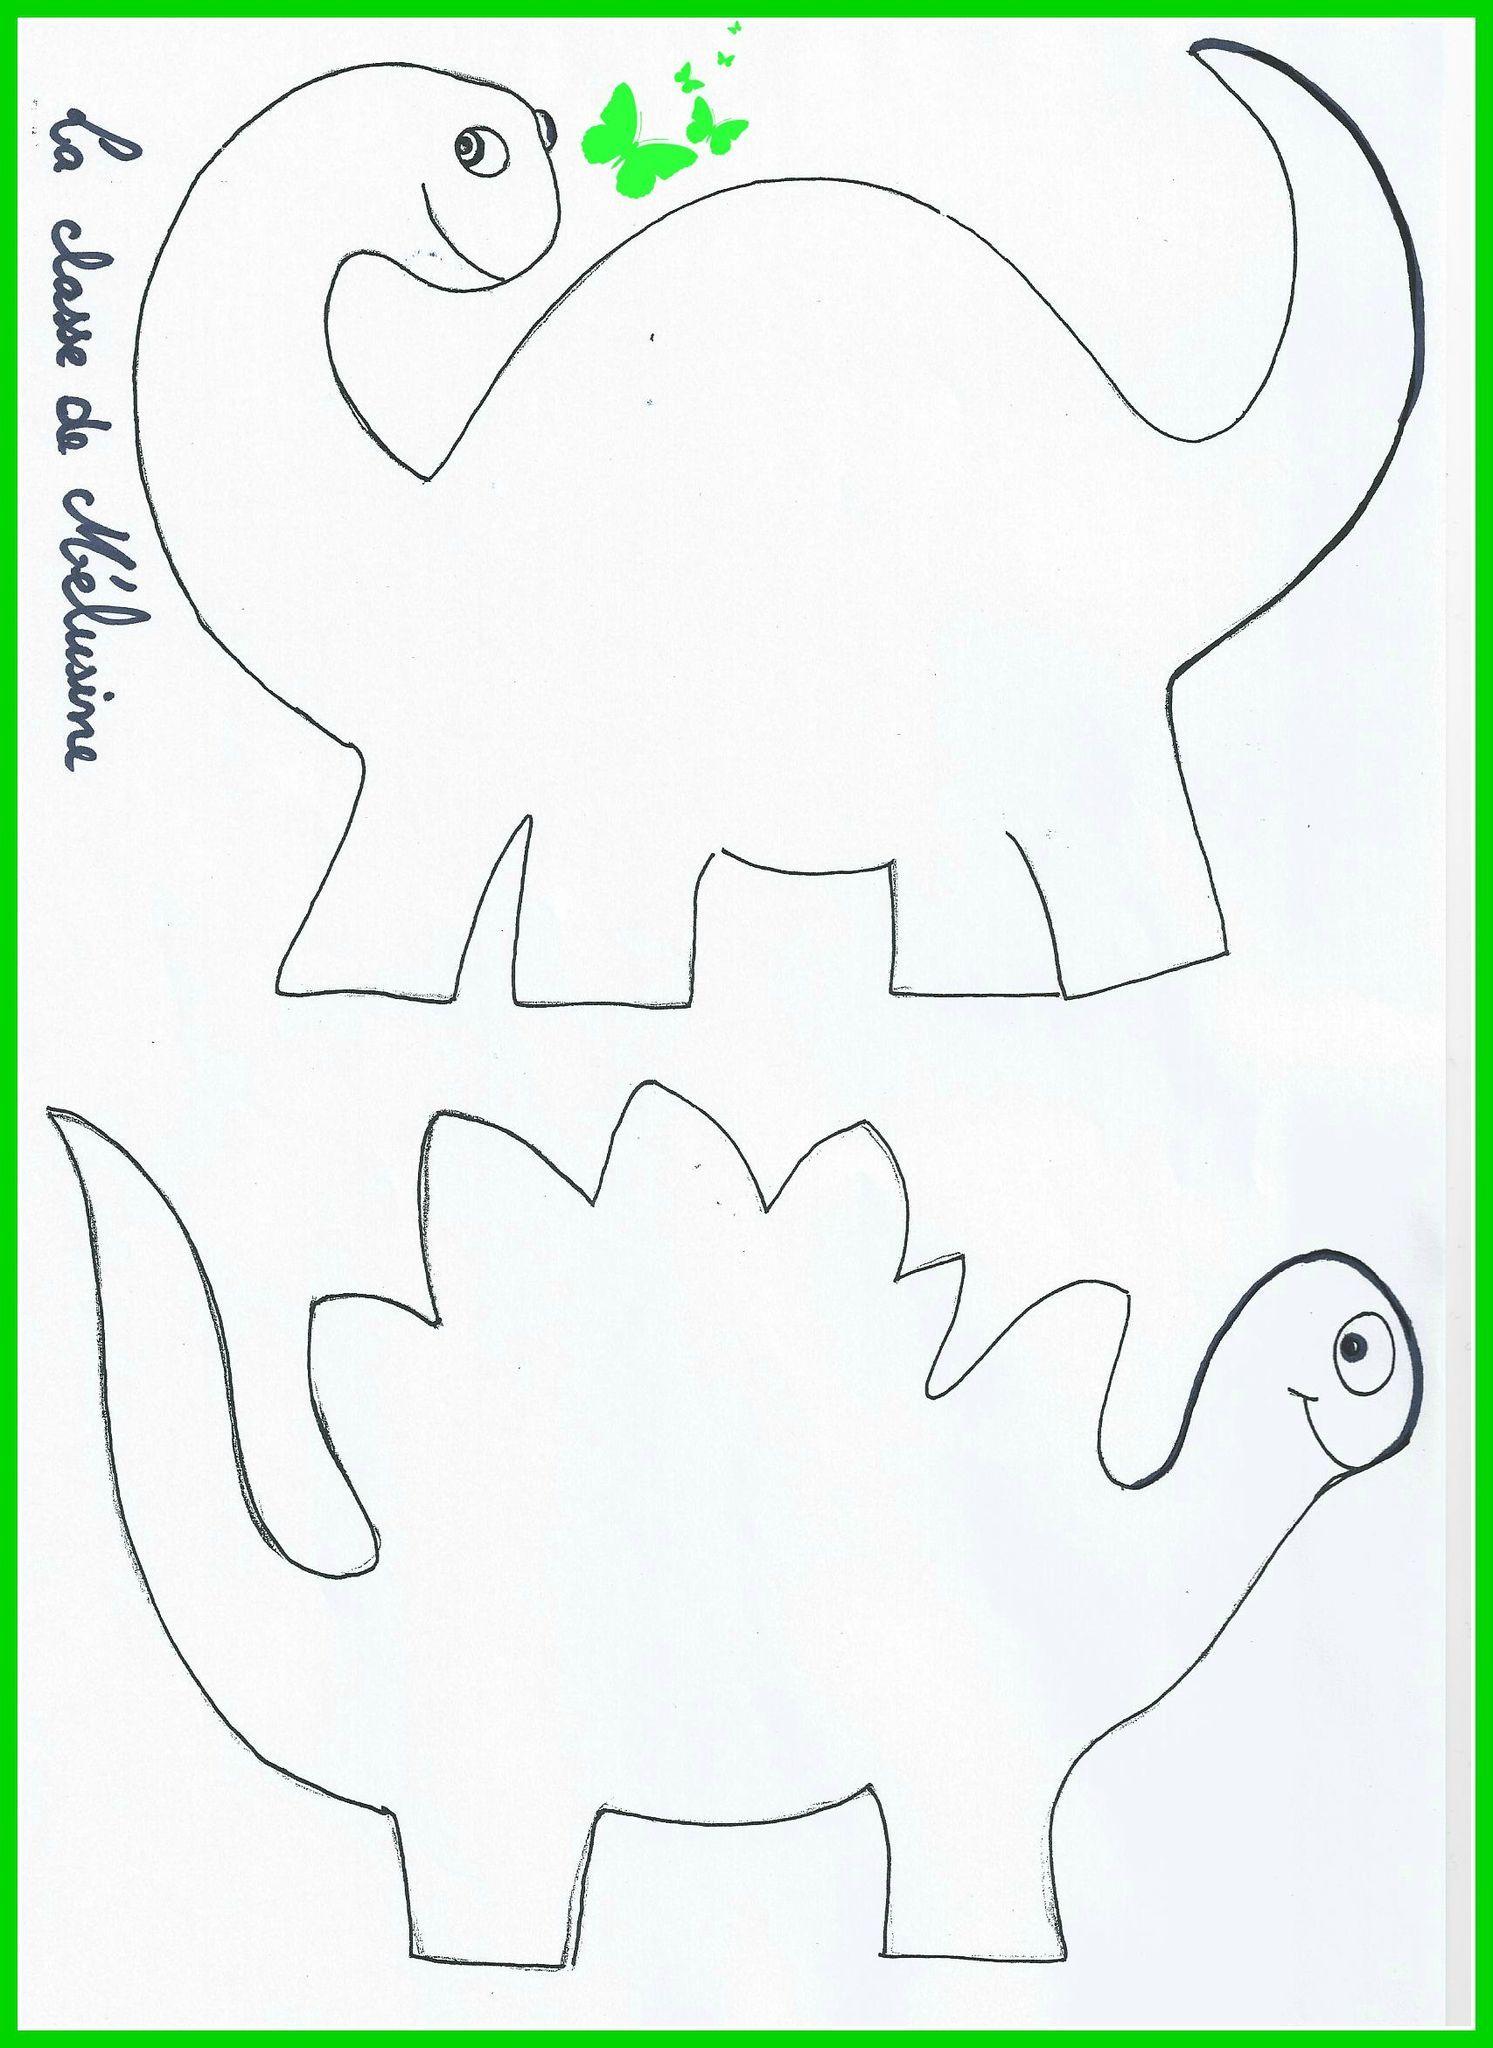 dinos gabarit photo · Coloriage DinosaureAnniversaire